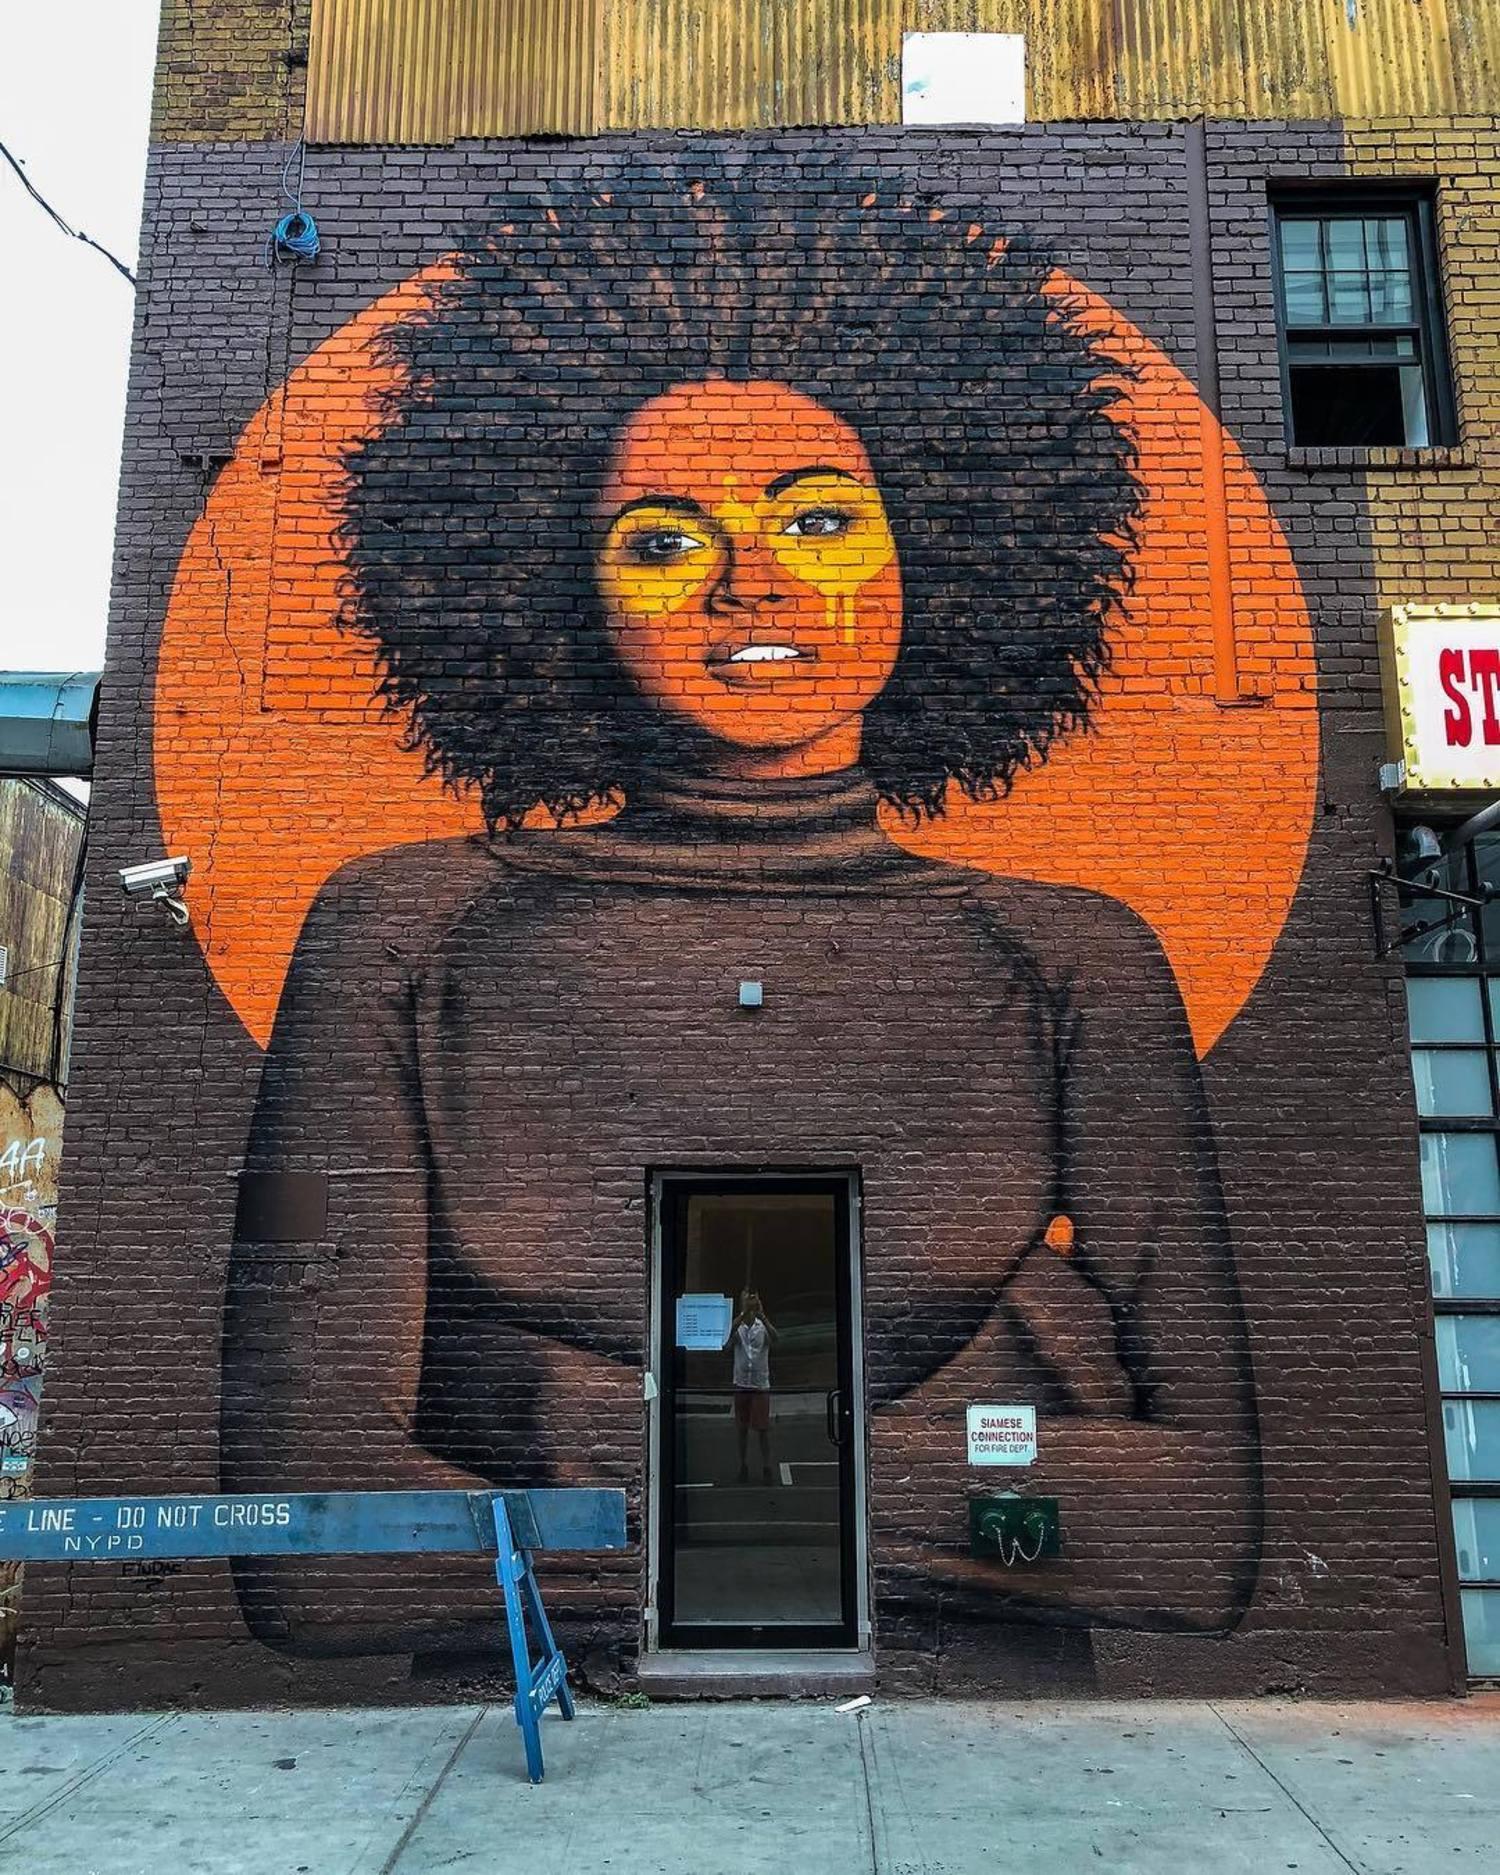 Fin Dac mural in Greenpoint, Brooklyn